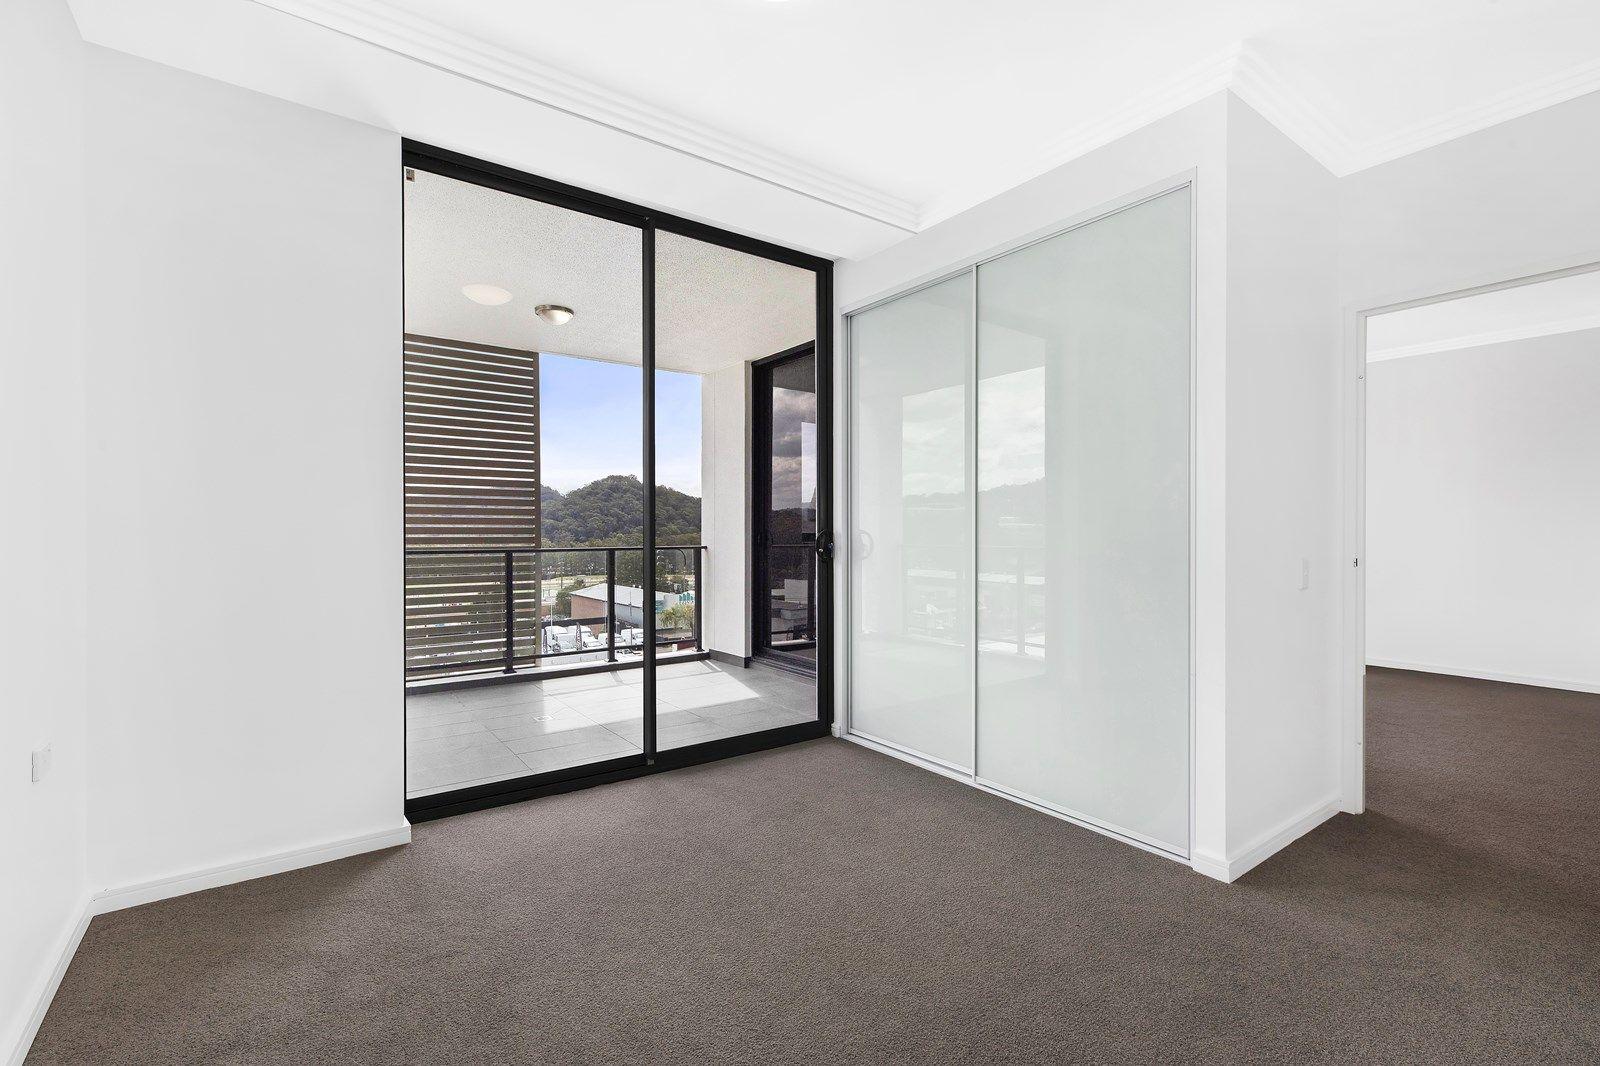 23/66-70 Hills Street, North Gosford NSW 2250, Image 2